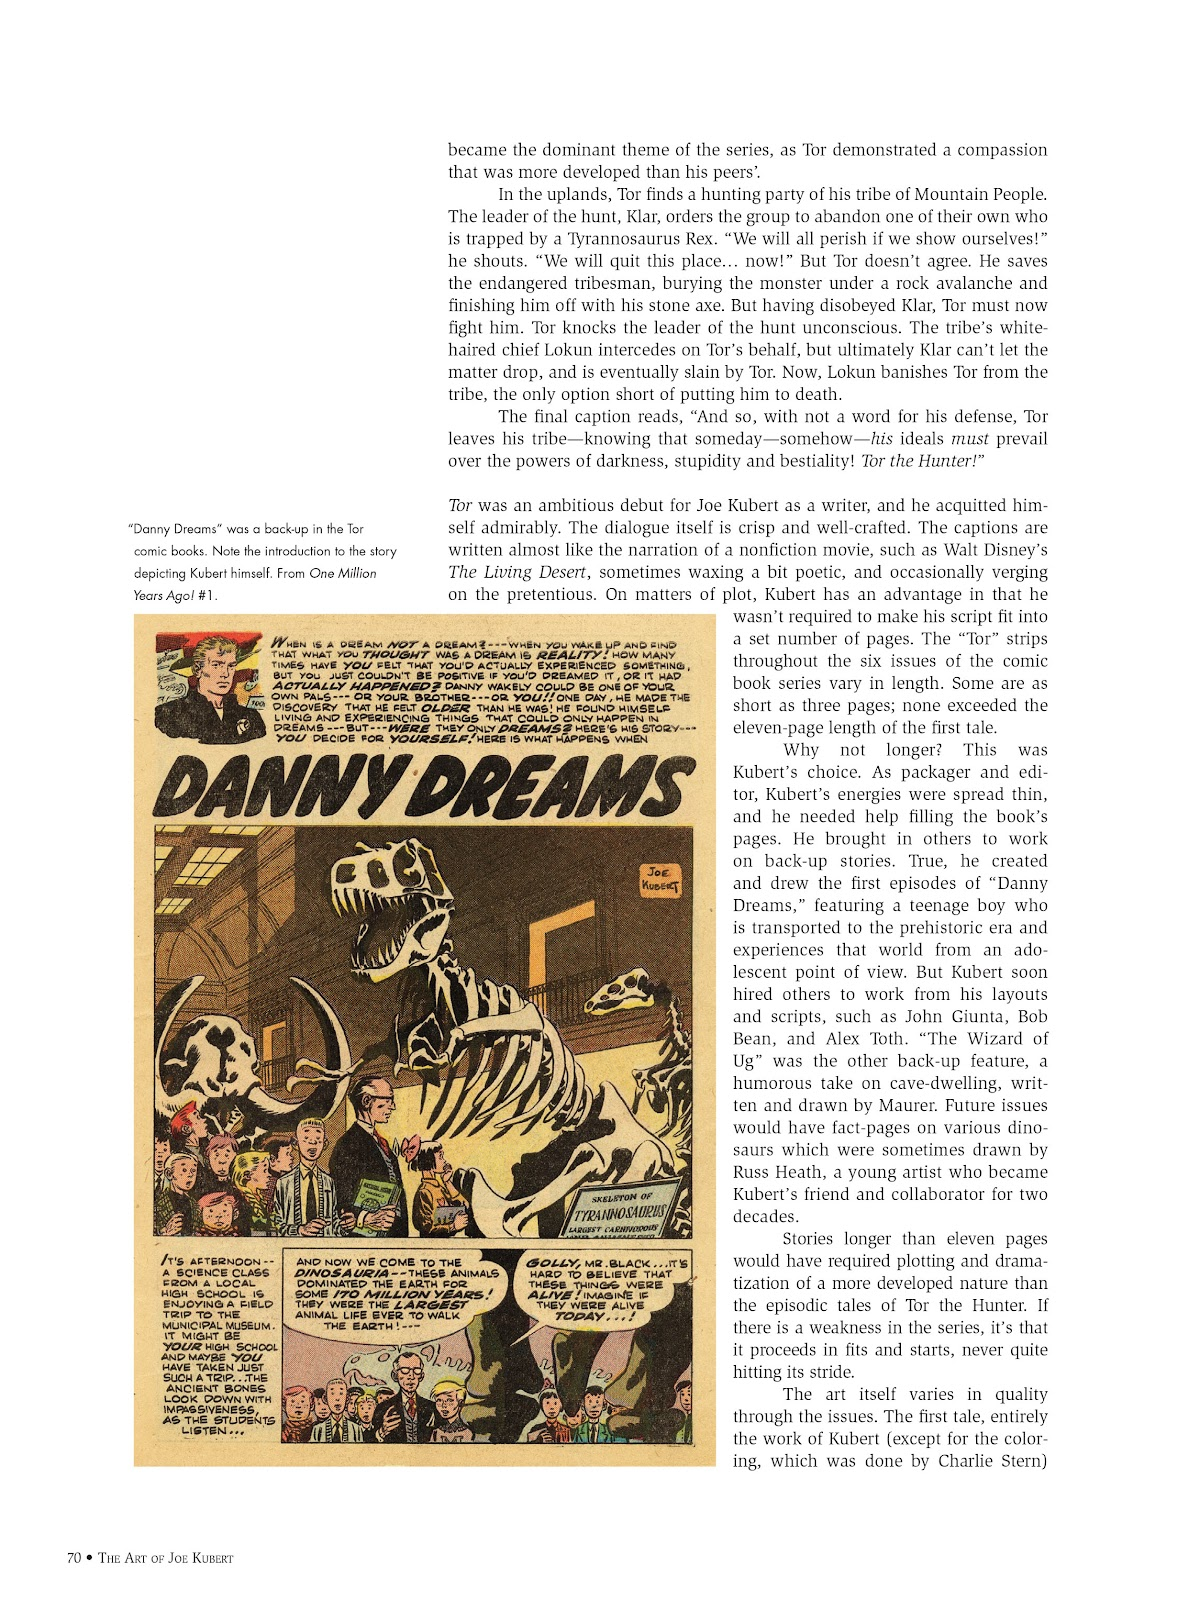 Read online The Art of Joe Kubert comic -  Issue # TPB (Part 1) - 69